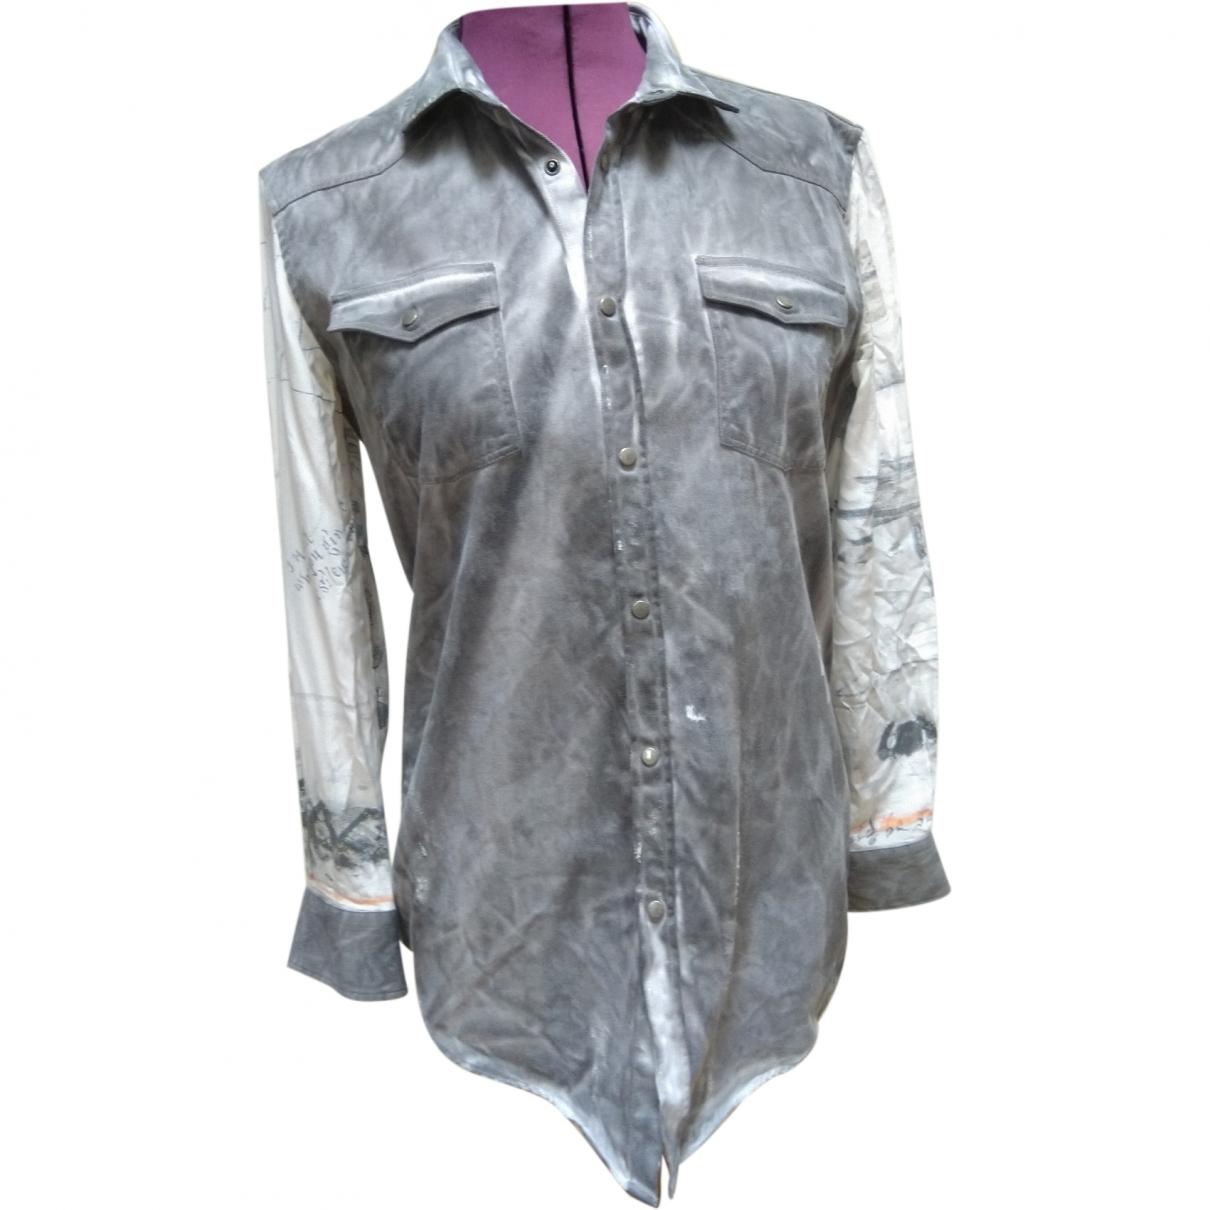 Each X \N Grey Cotton Shirts for Men M International